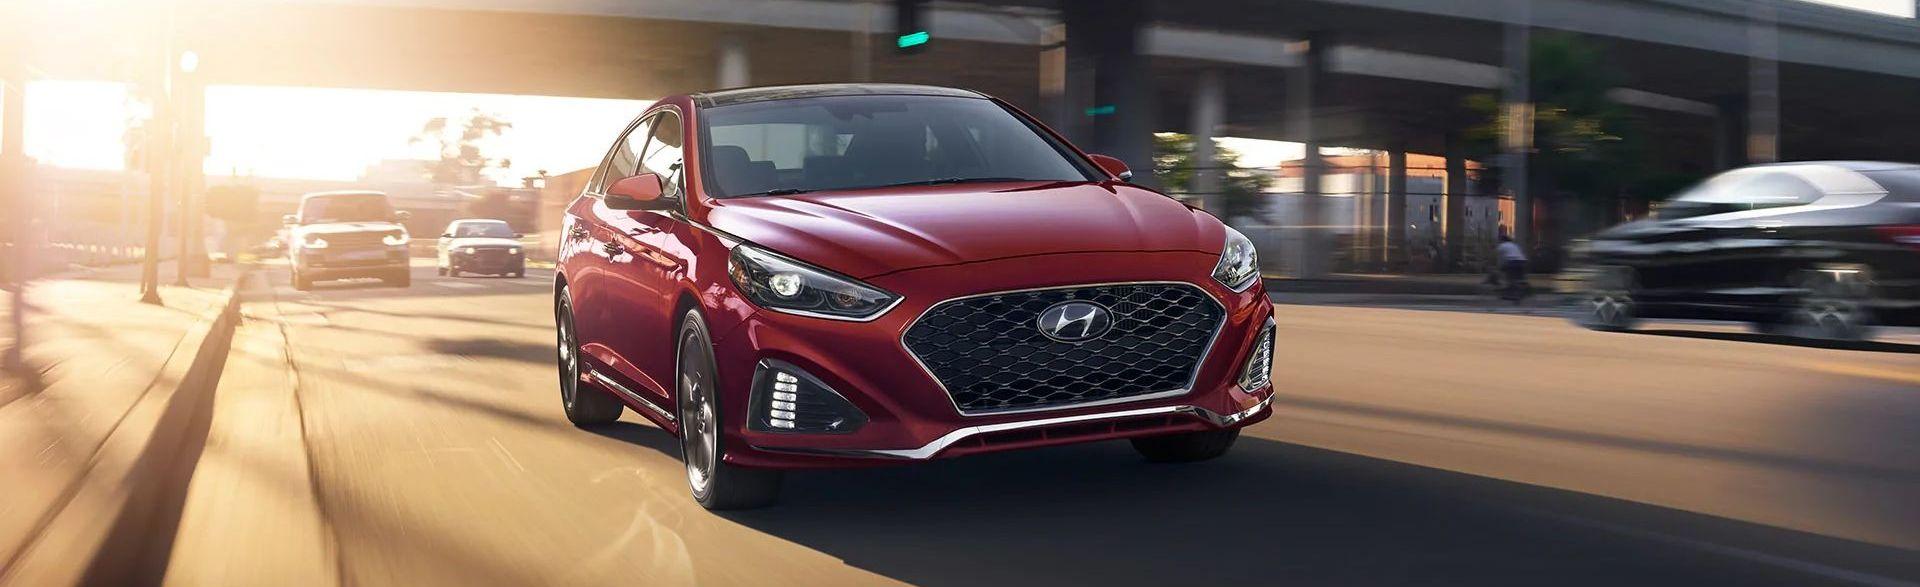 2019 Hyundai Sonata Leasing near Washington, DC